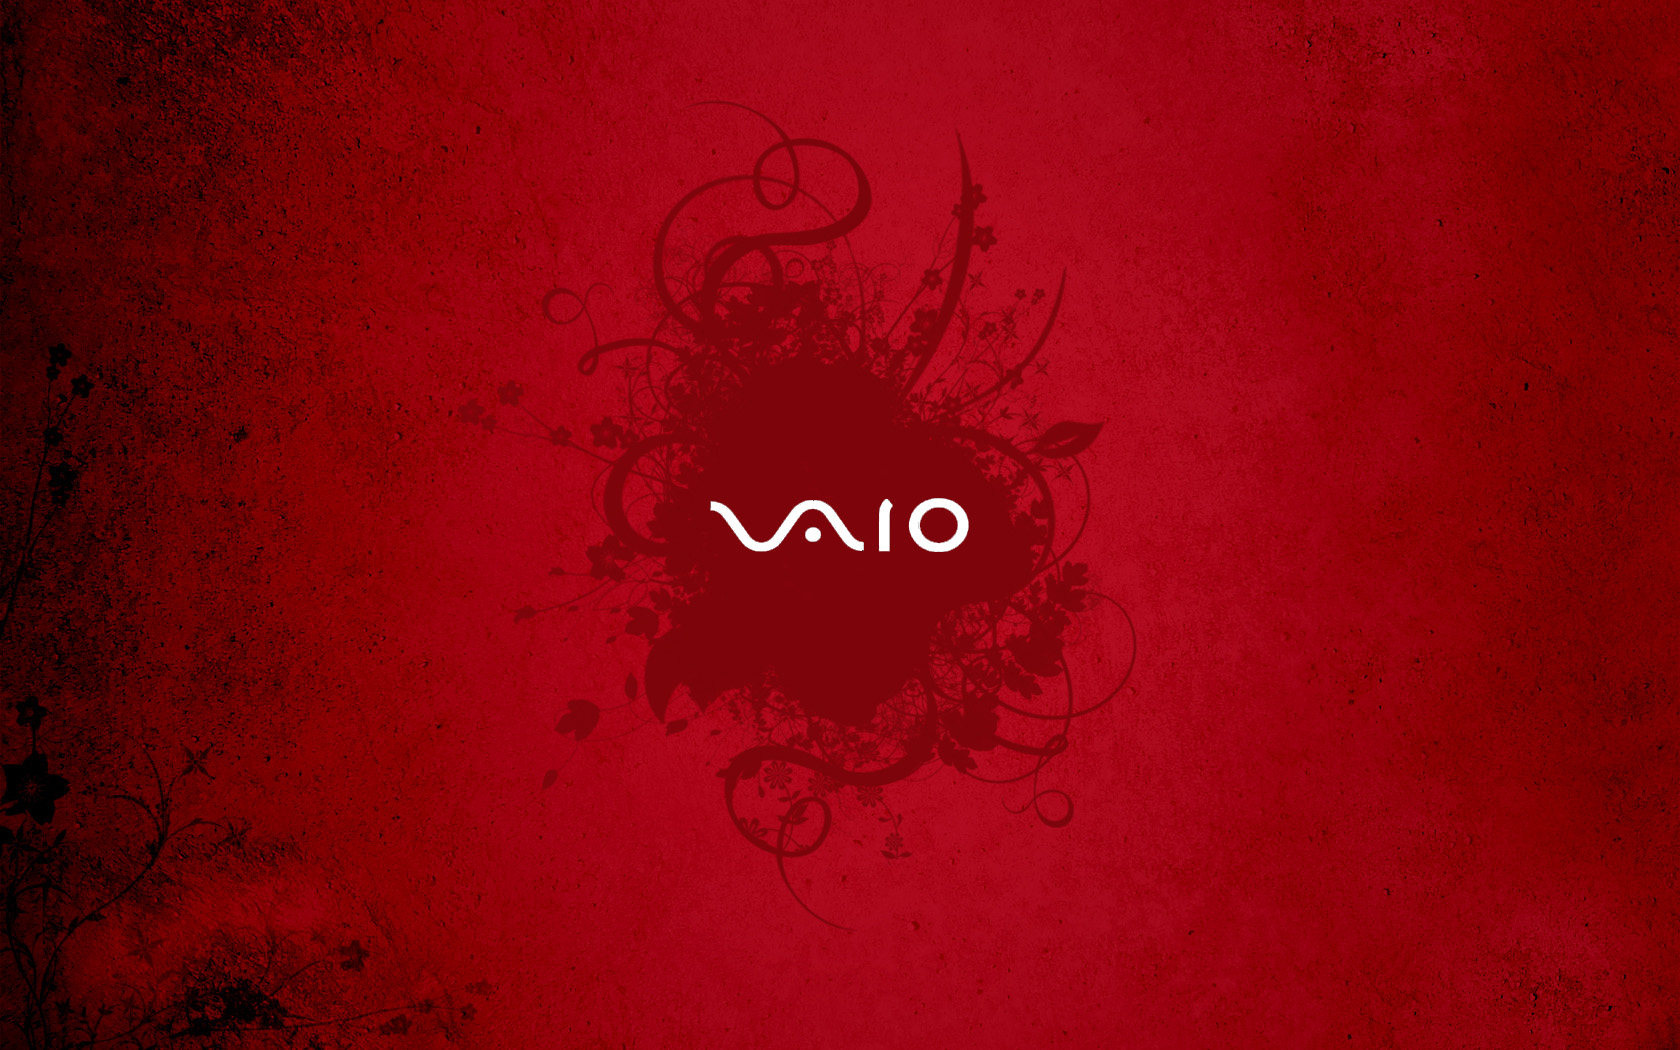 Sony Vaio Logo Red Wallpaper Hd 1680x1050 iWallHD Wallpaper HD 1680x1050